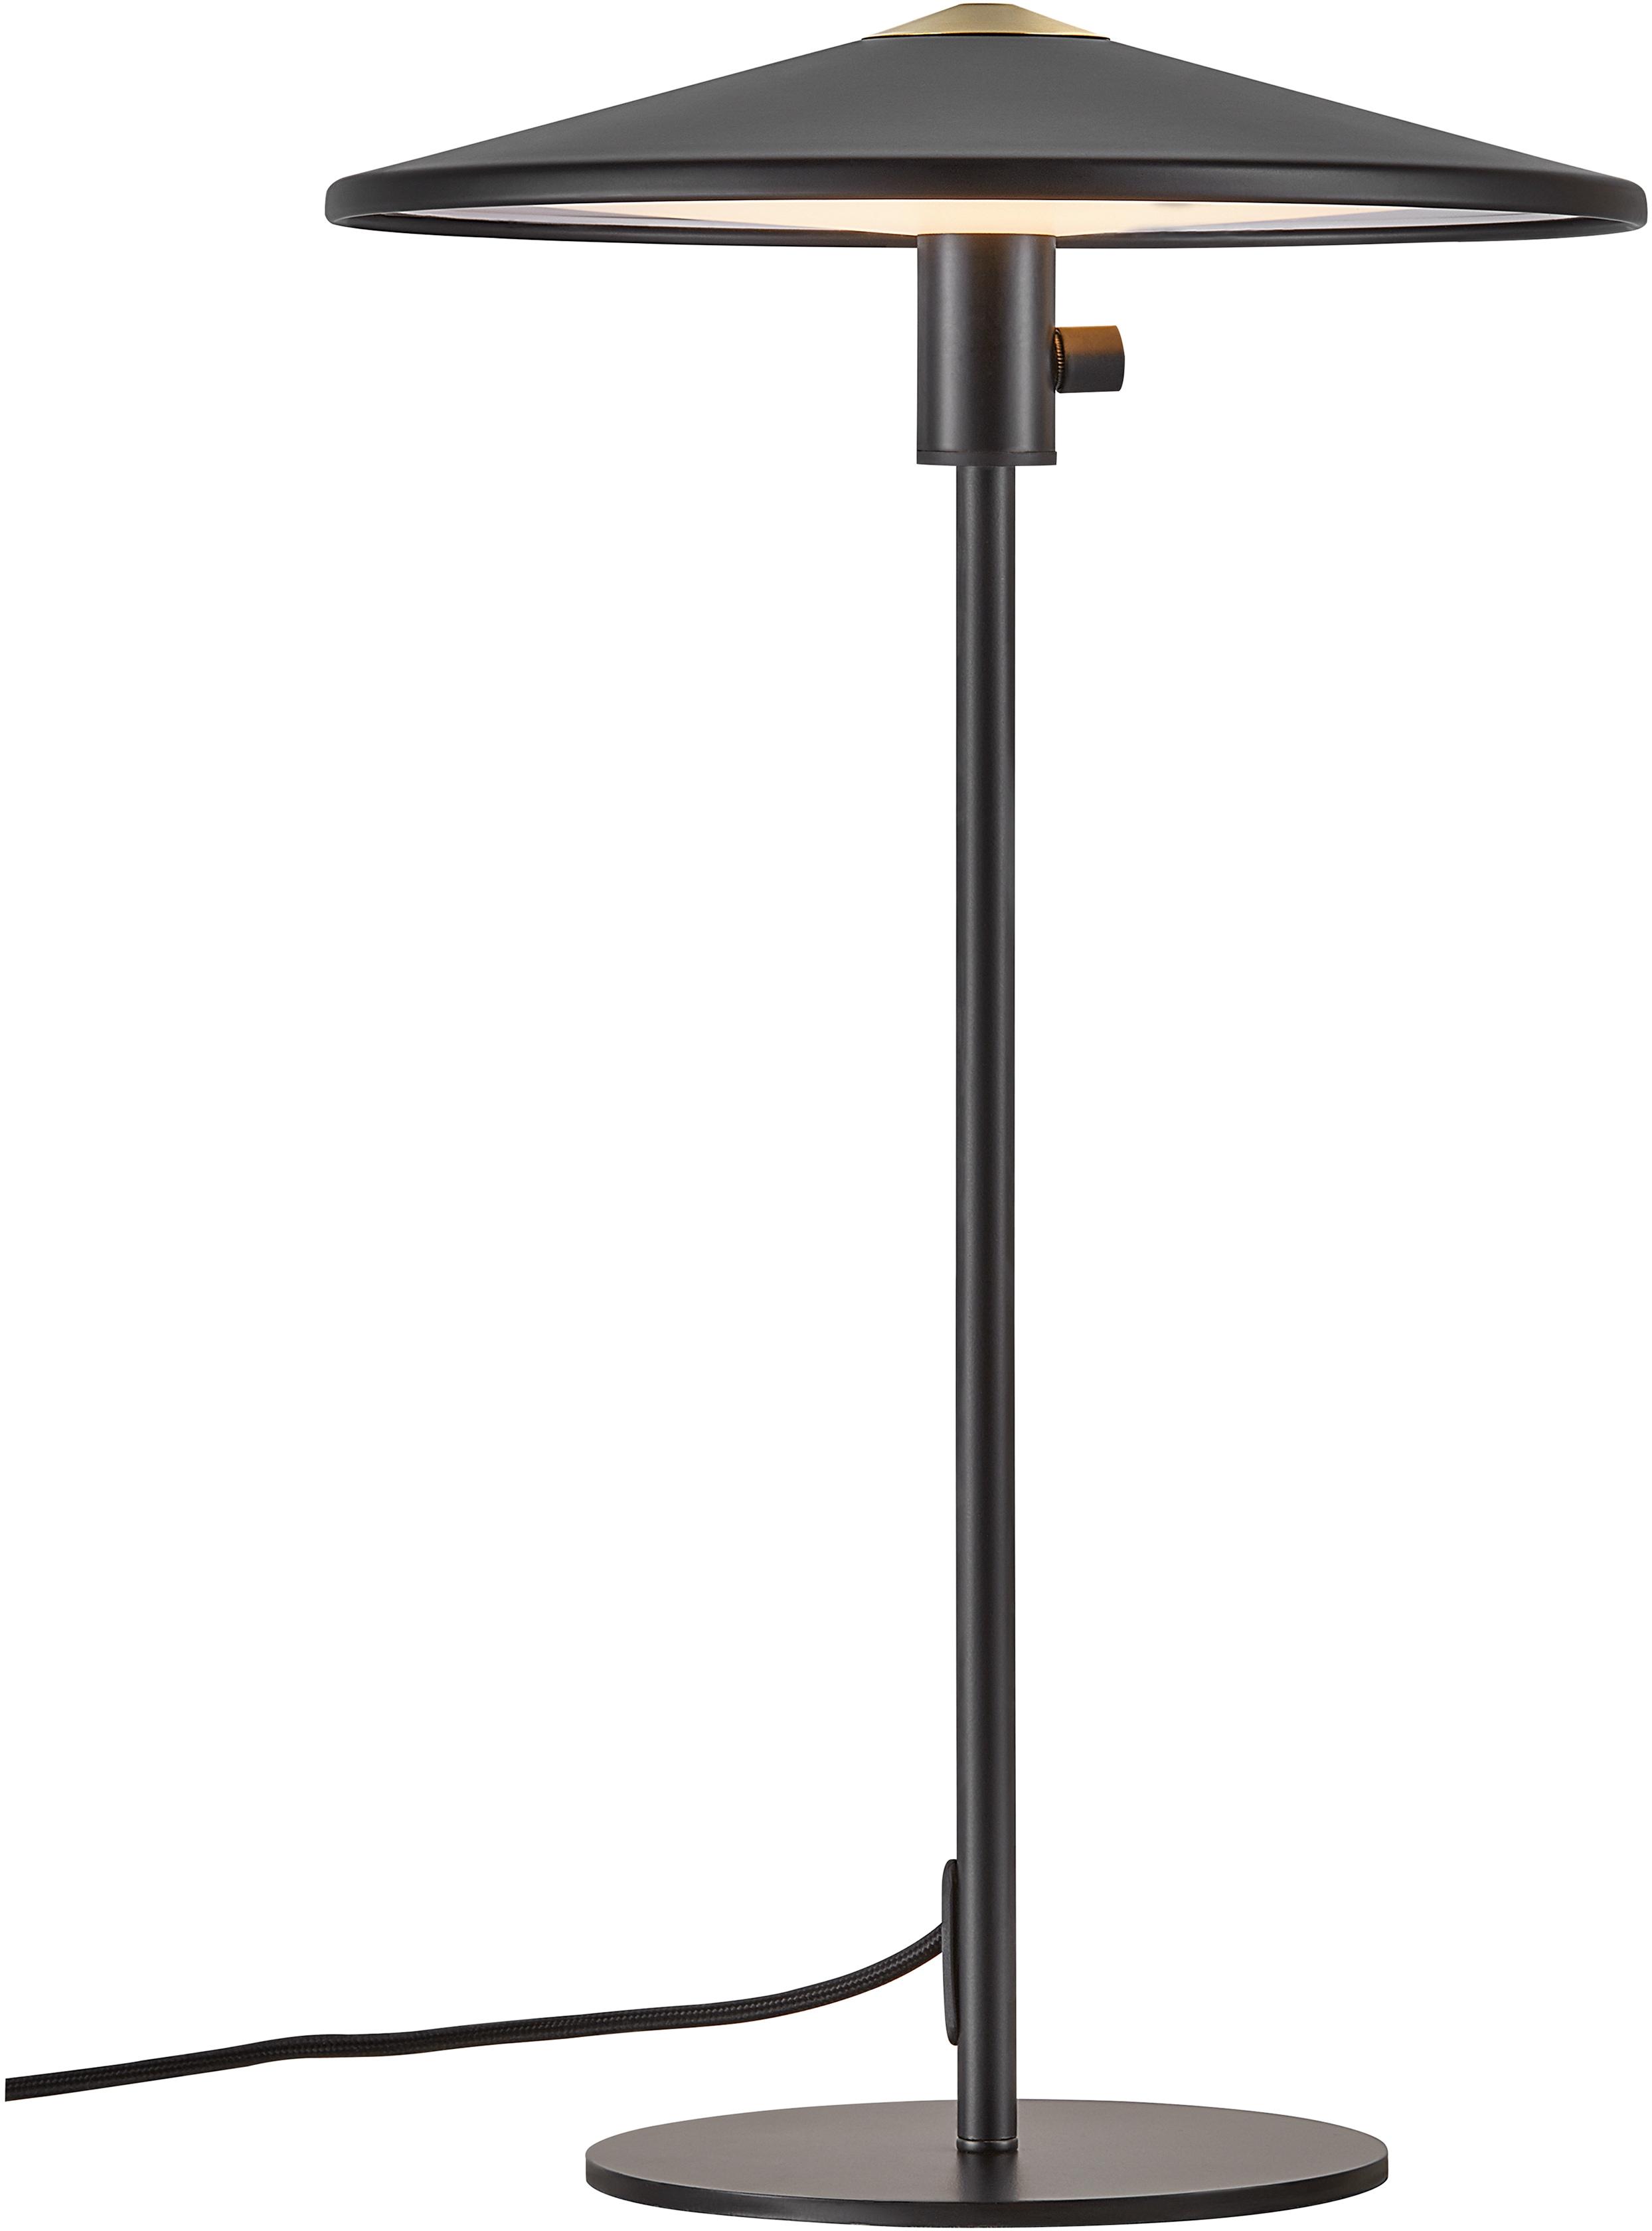 Nordlux LED Tischleuchte BALANCE, LED-Modul, Warmweiß, inkl. LED Modul + Dimmer